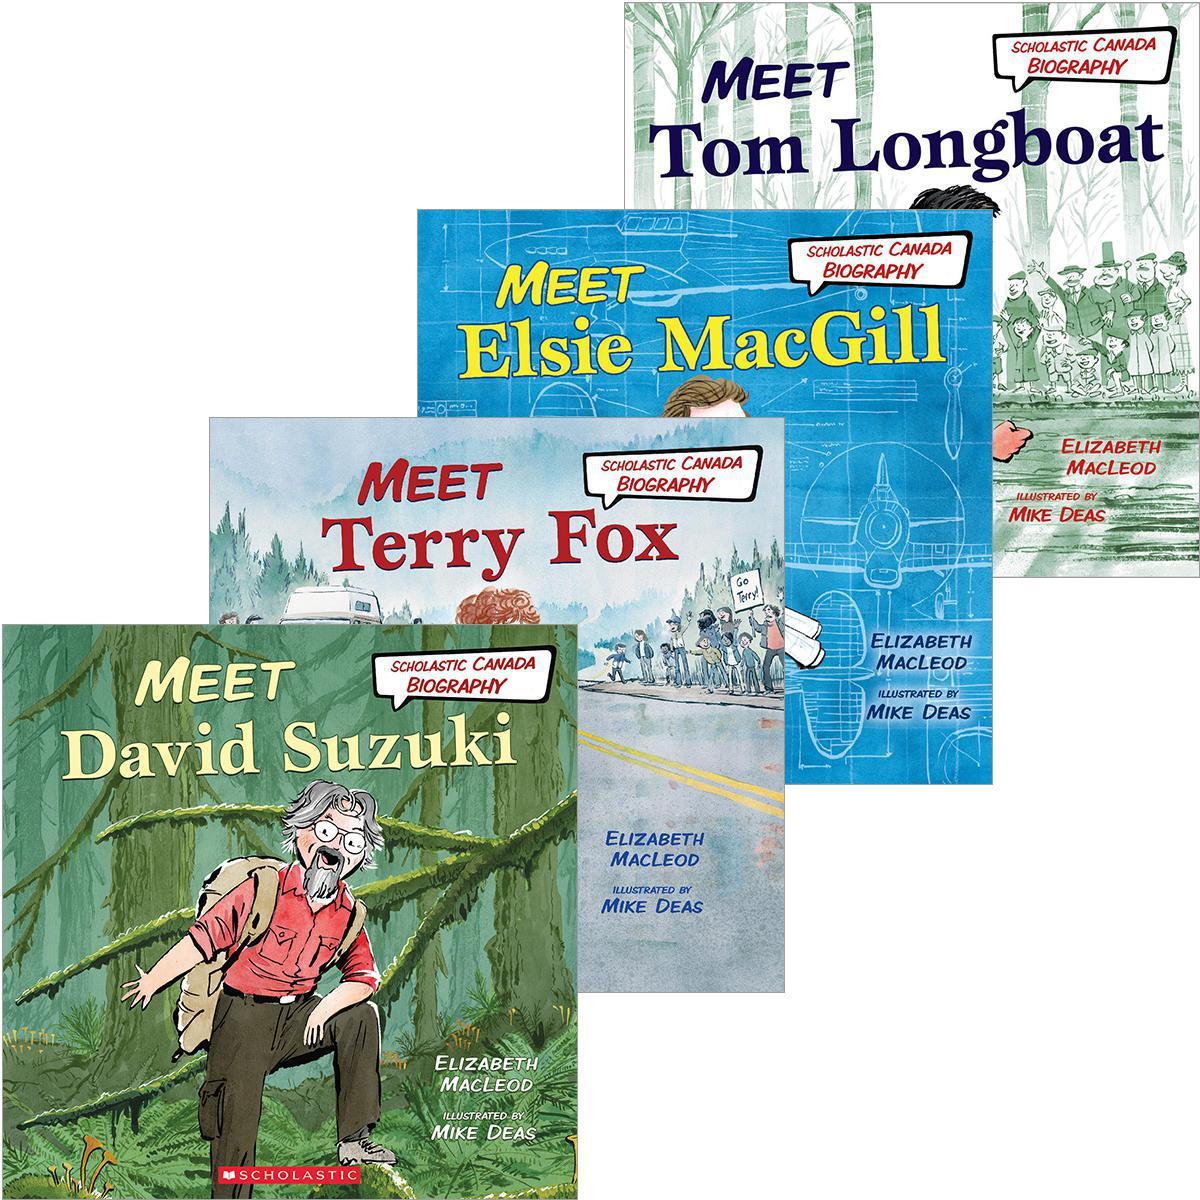 Scholastic Canada Biography Mega Pack